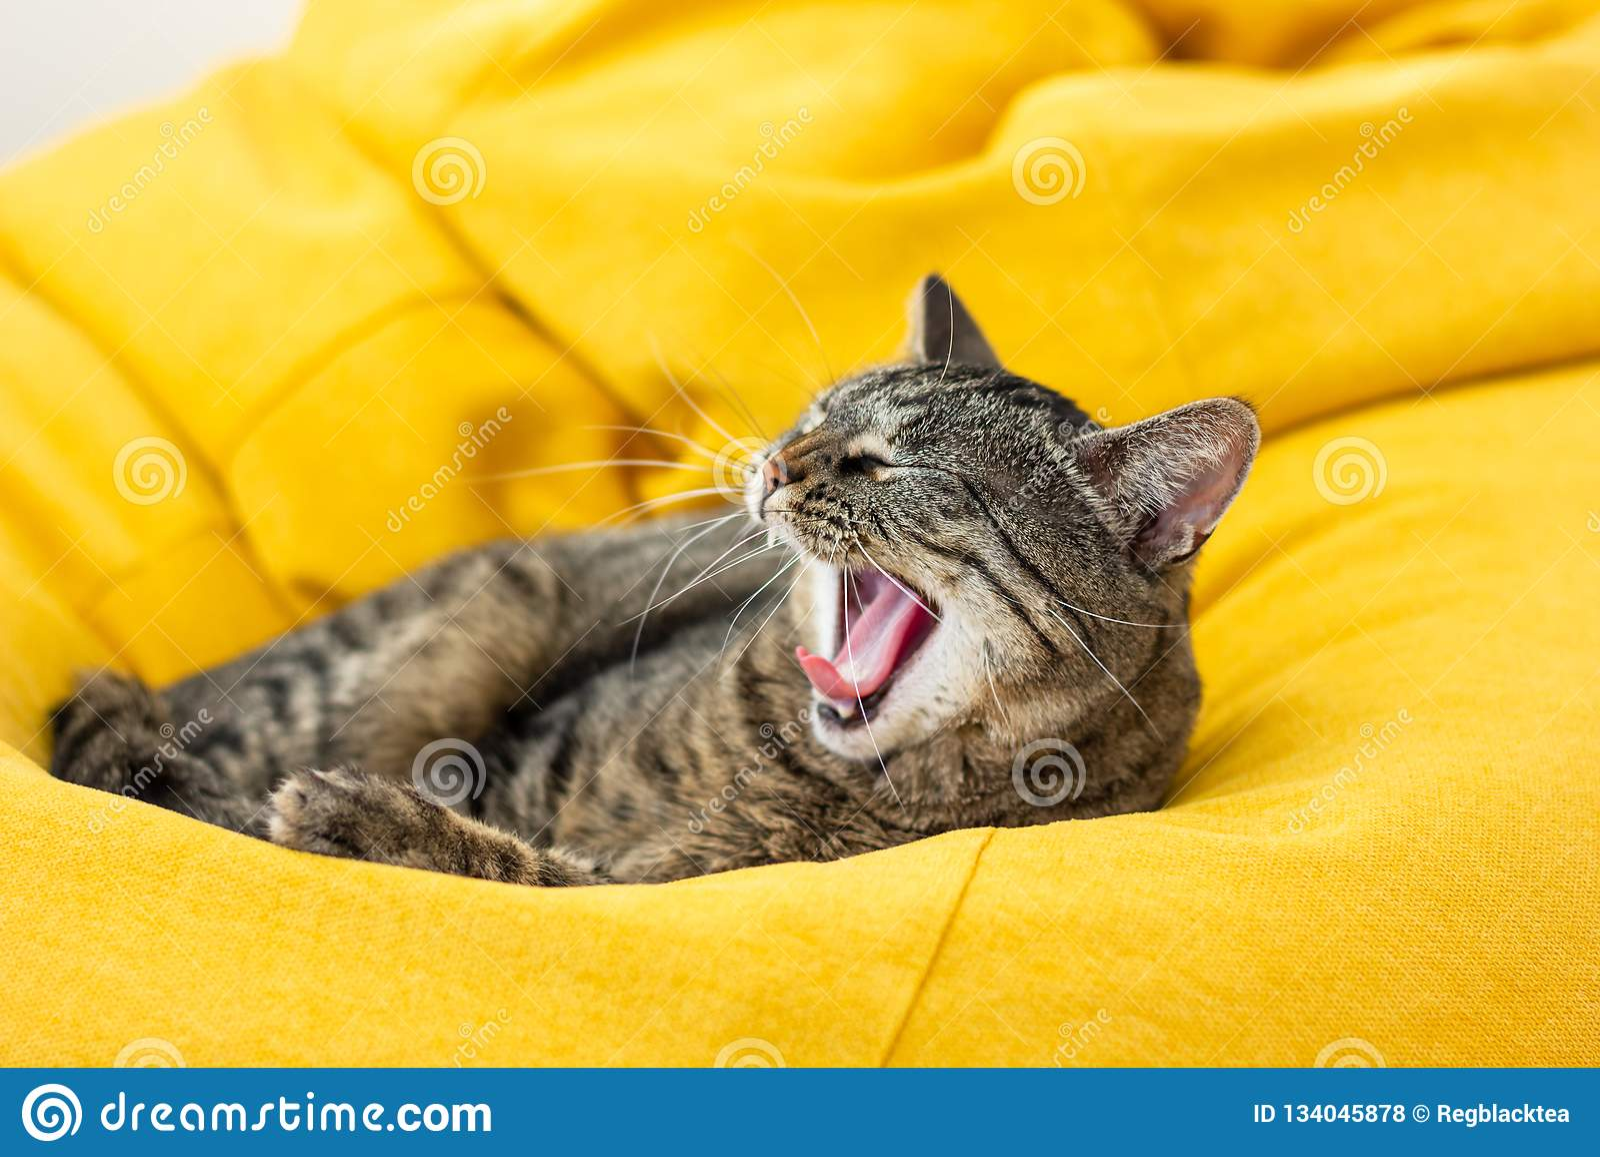 Leuke tijgerkat die op helder geel kinderspel liggen